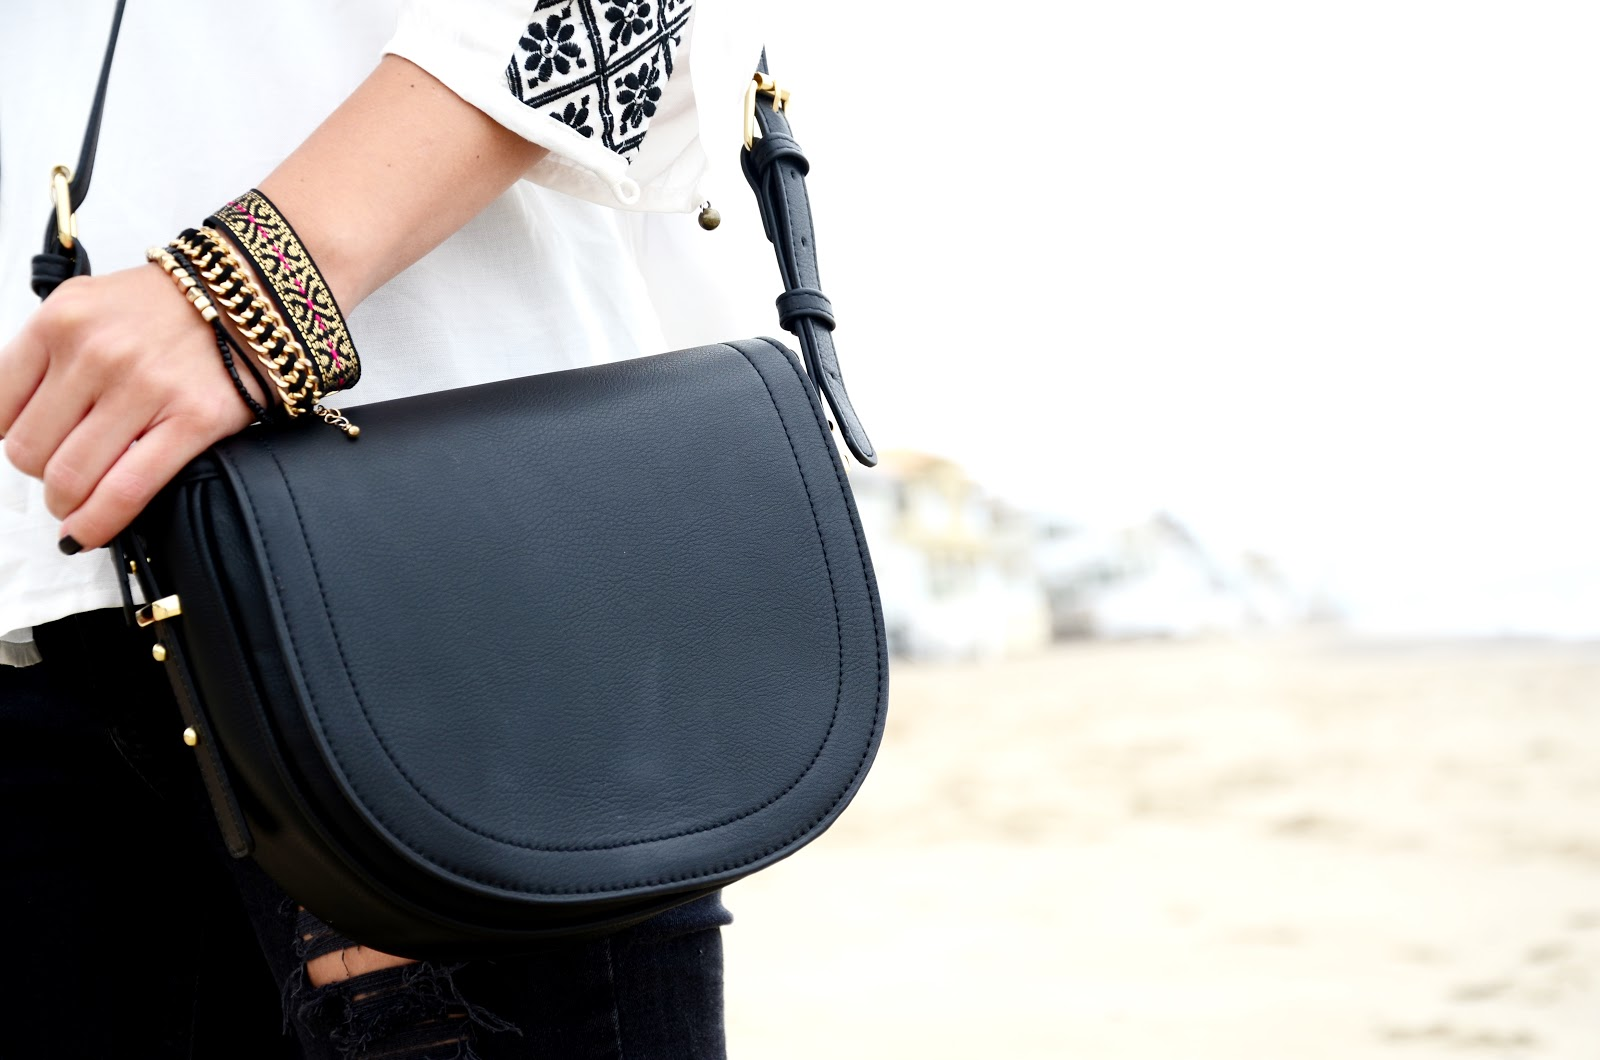 carriedaway Fashionblog Modeblog carriedaway